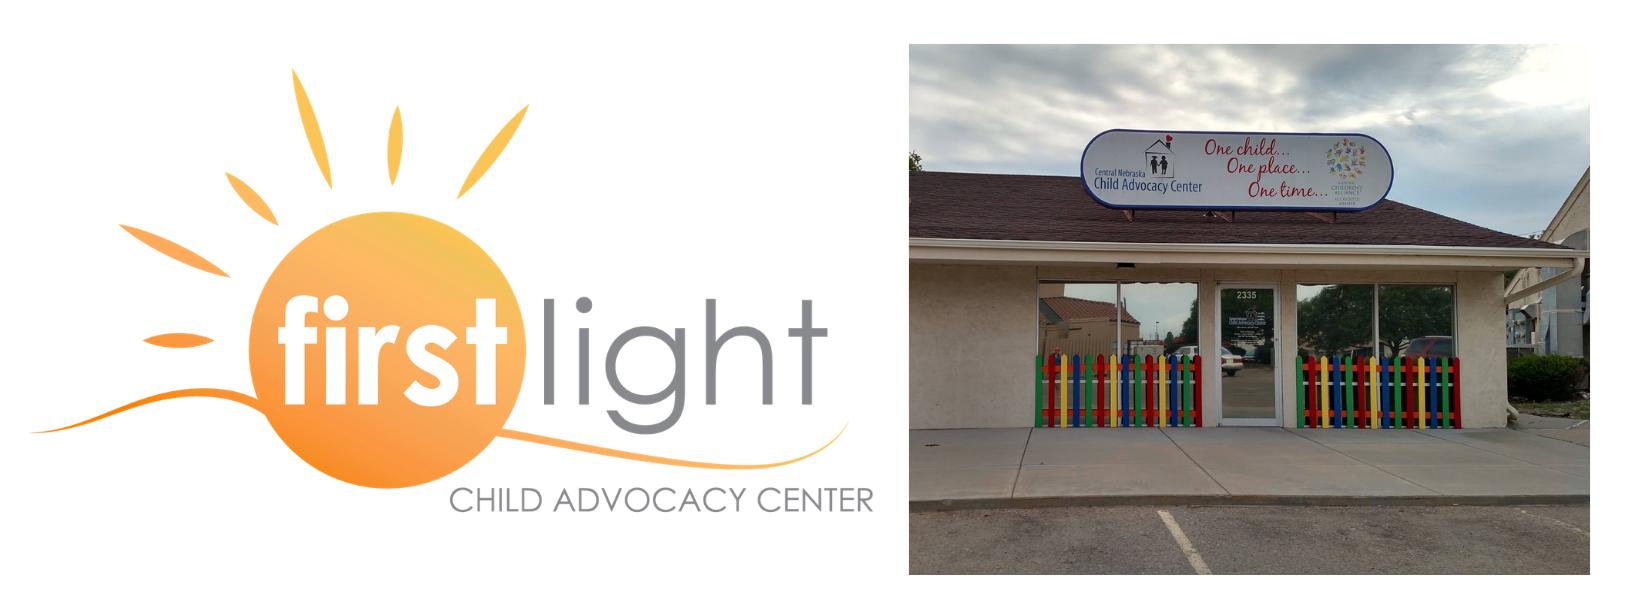 First Light Child Advocacy Center - Grand Island